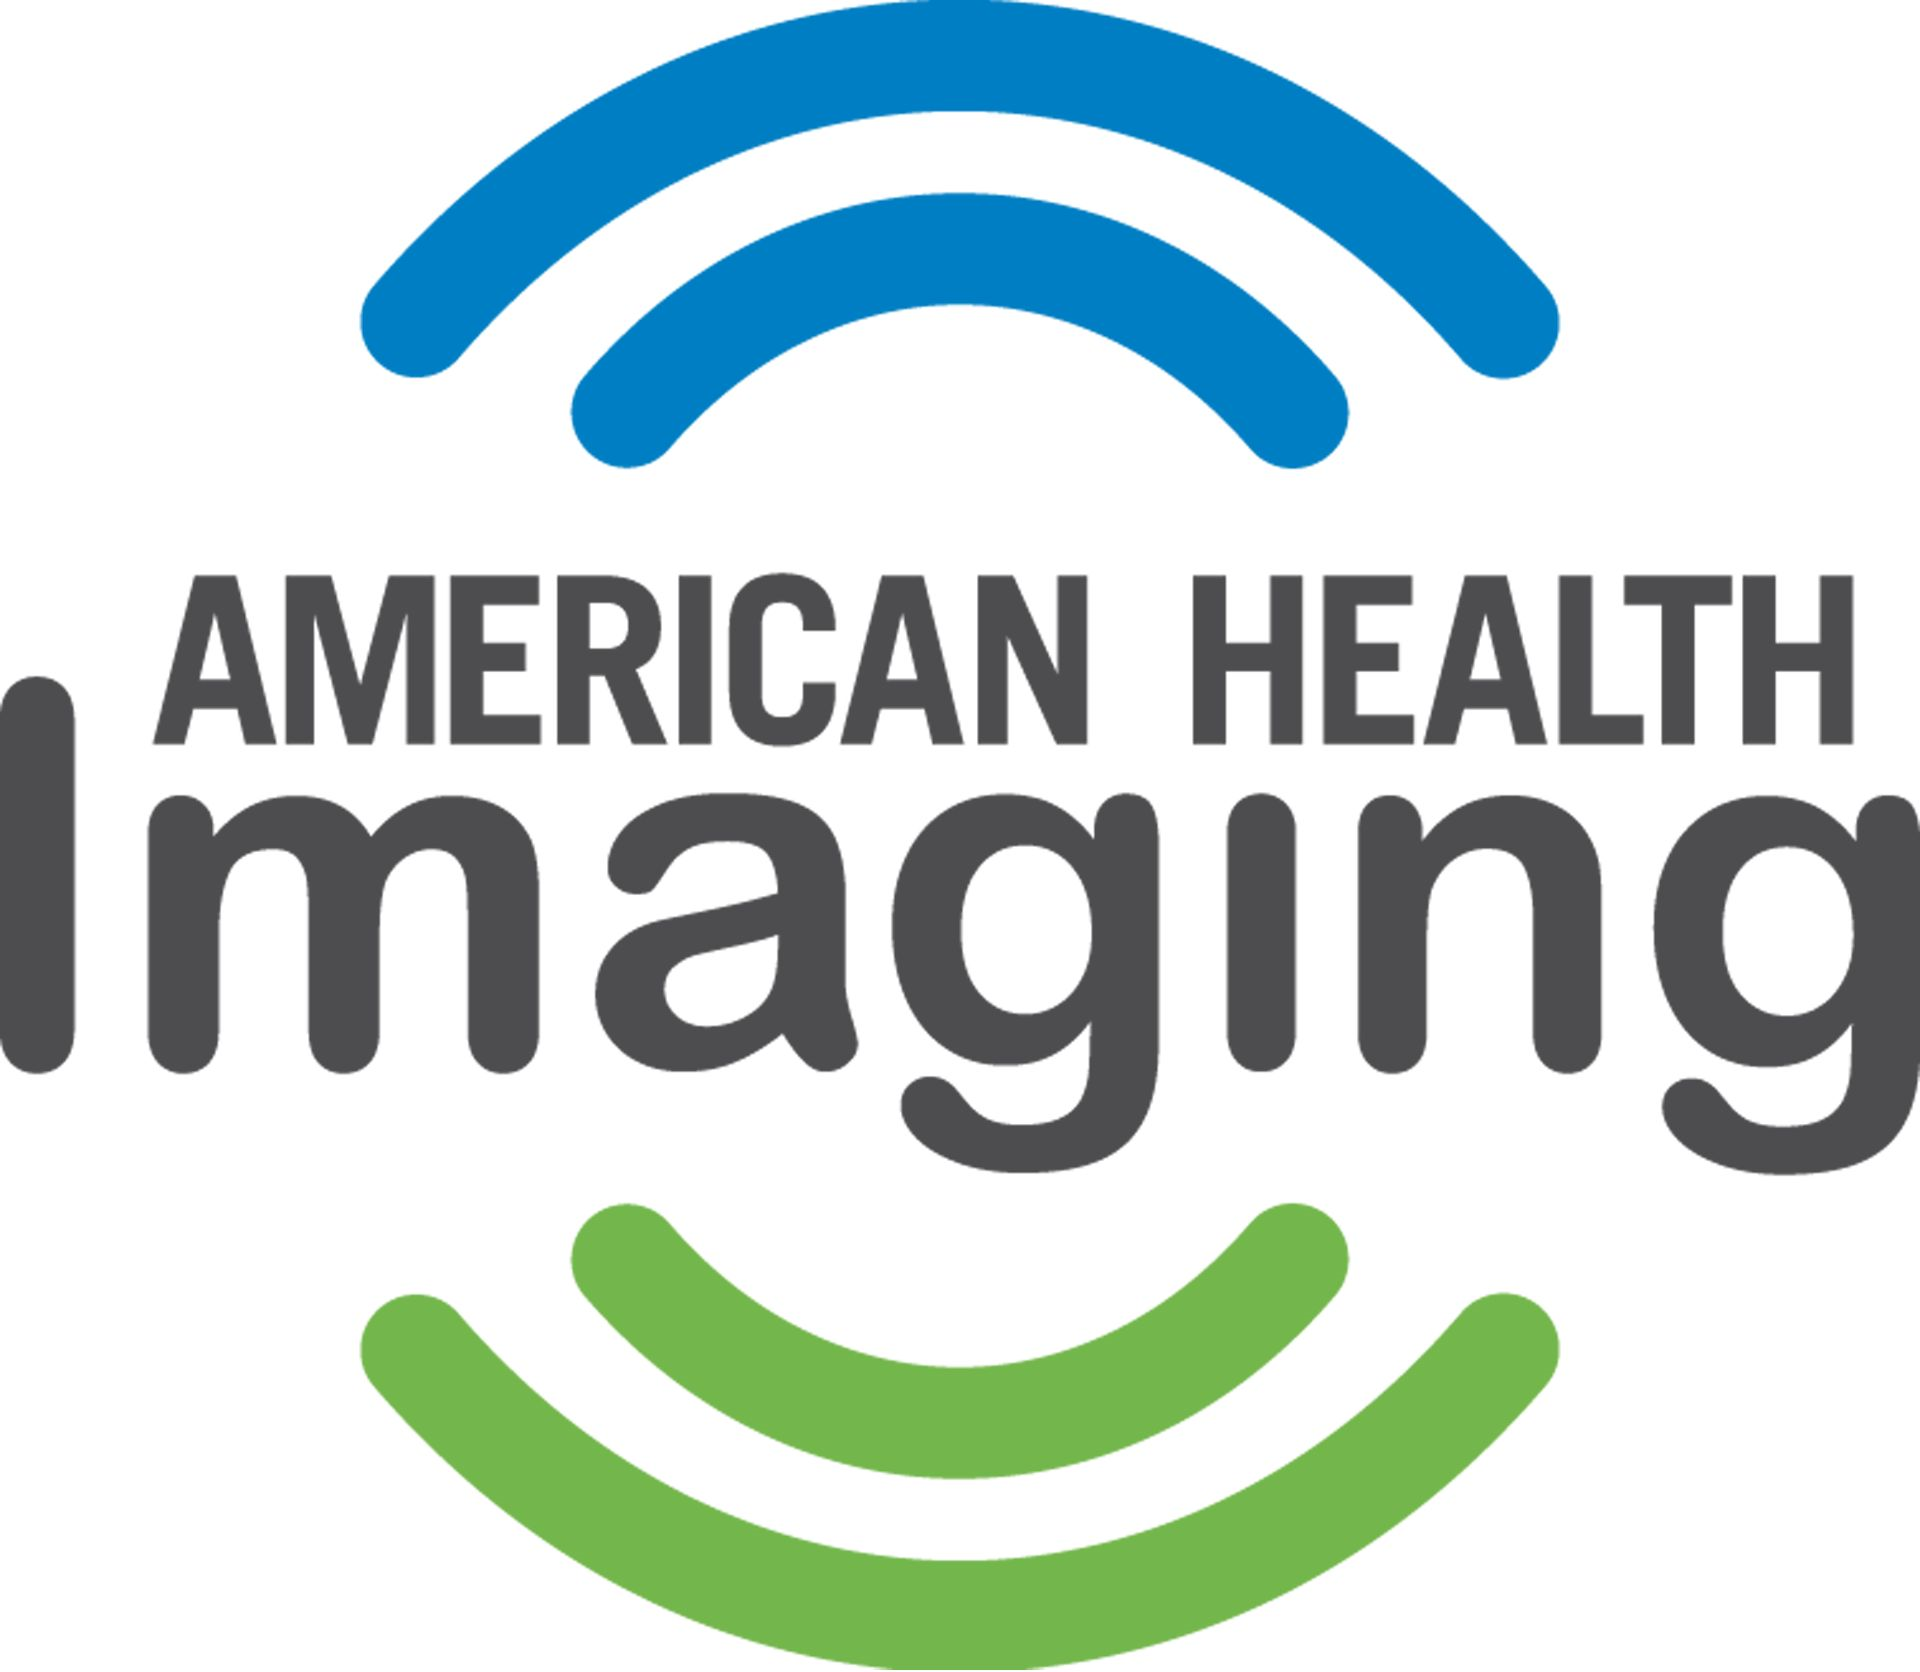 American Health Imaging Company Logo